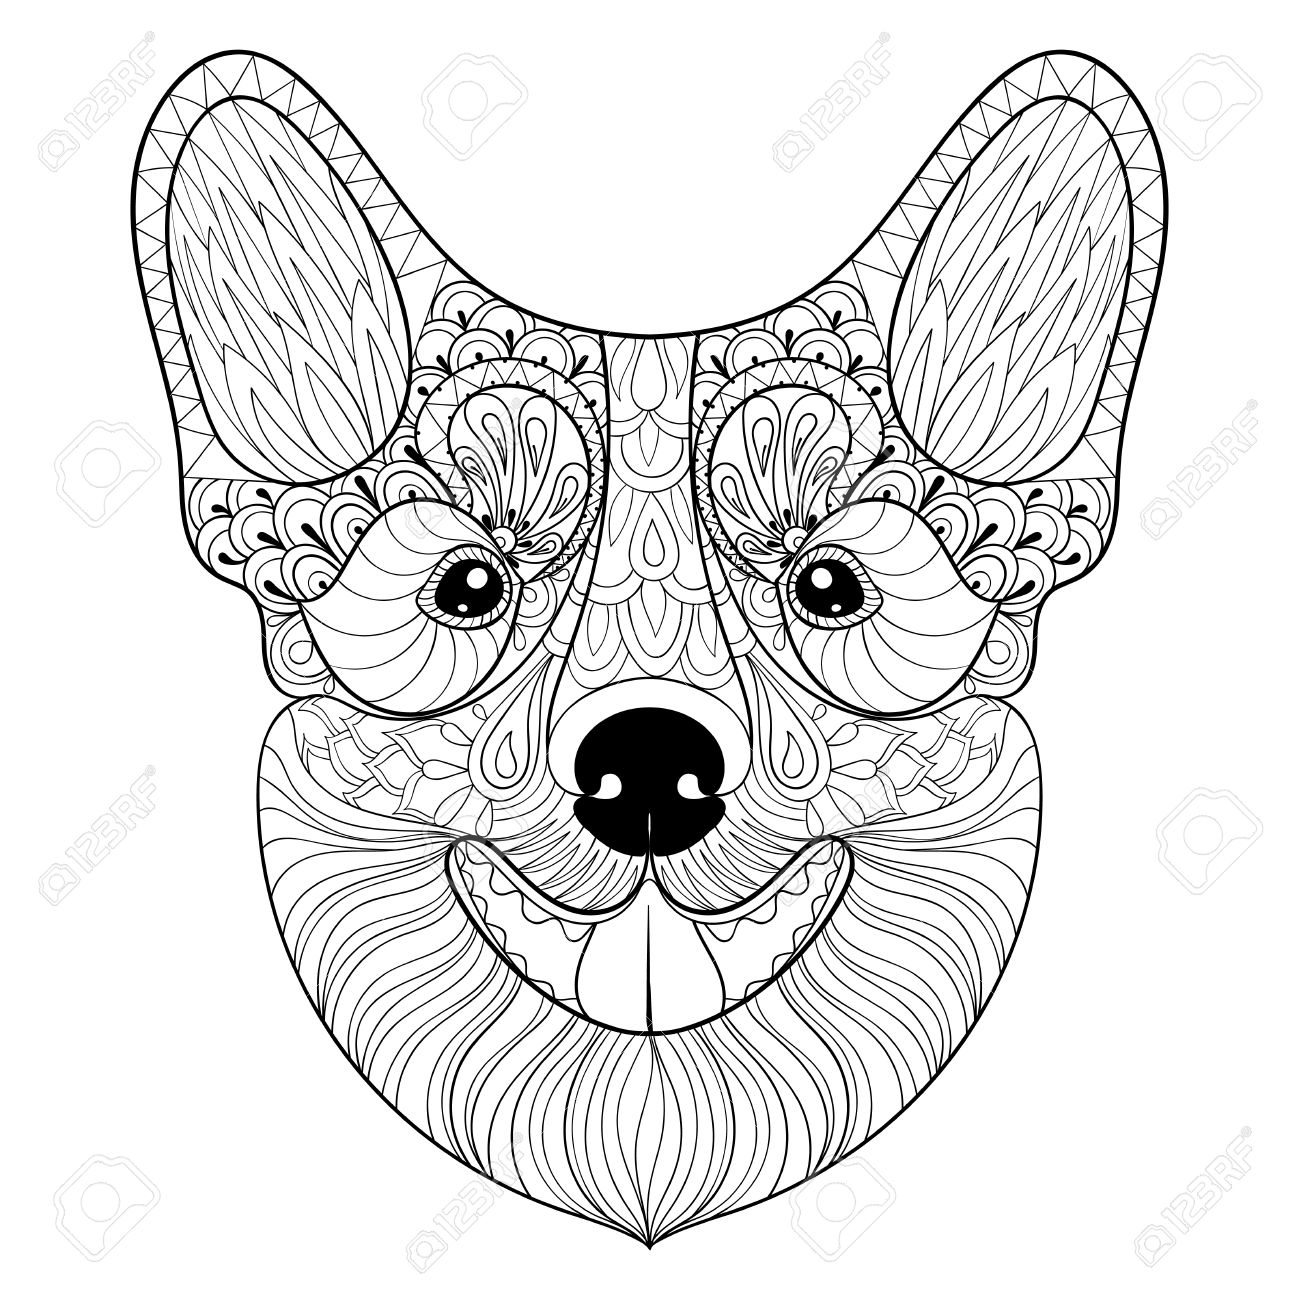 Dog Face In Monochrome Doodle Style. Puppy, Pembroke Welsh Corgi ...